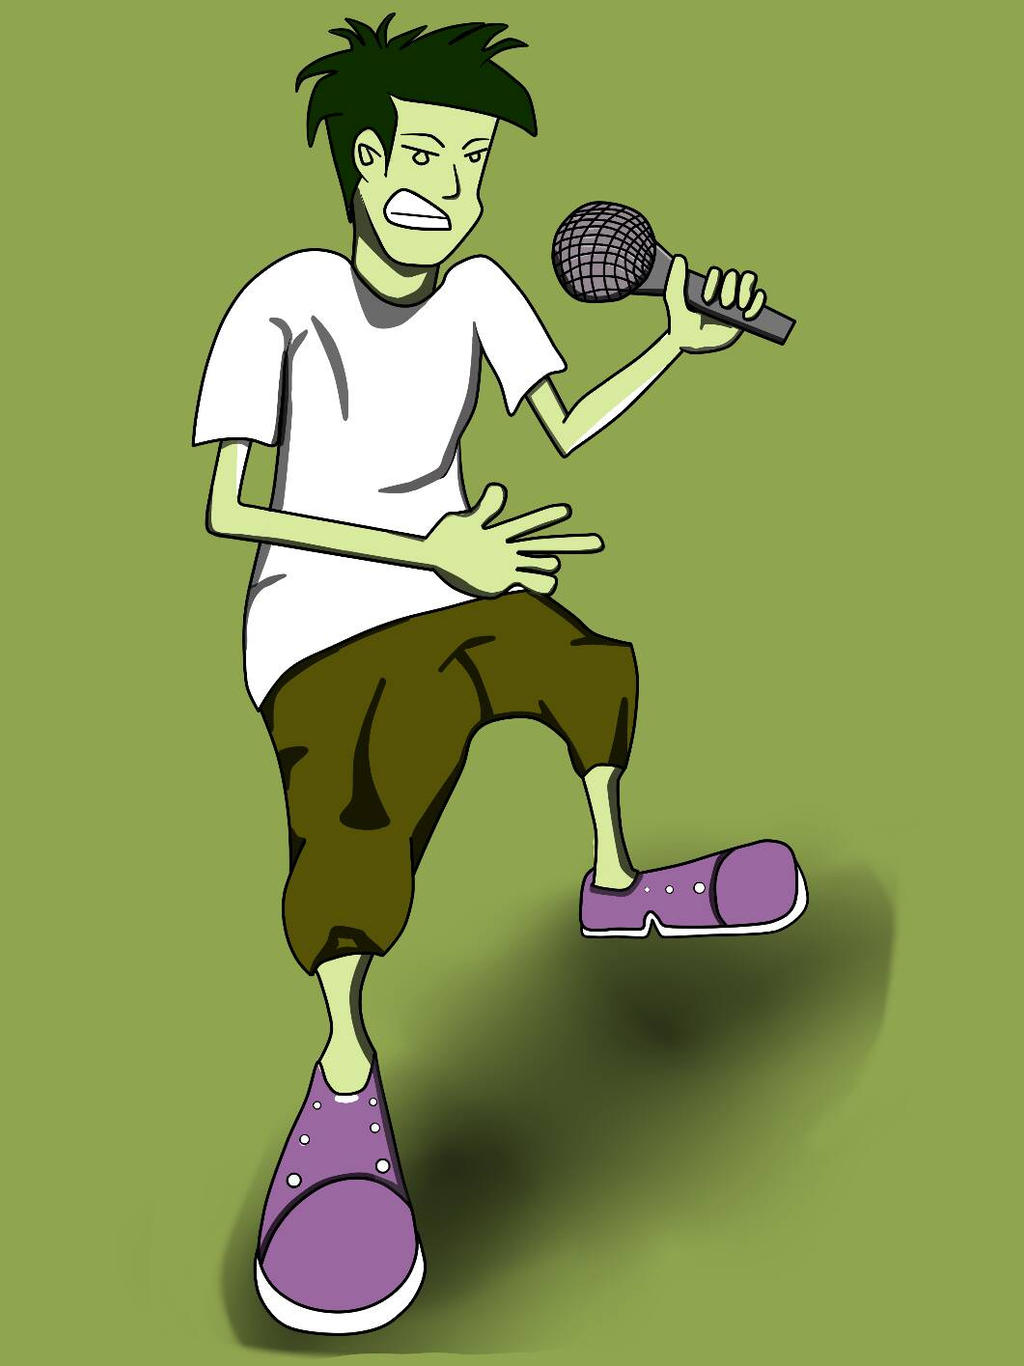 Adobe Flash Character Drawing By Fazlesam By Fazlesam0 On Deviantart